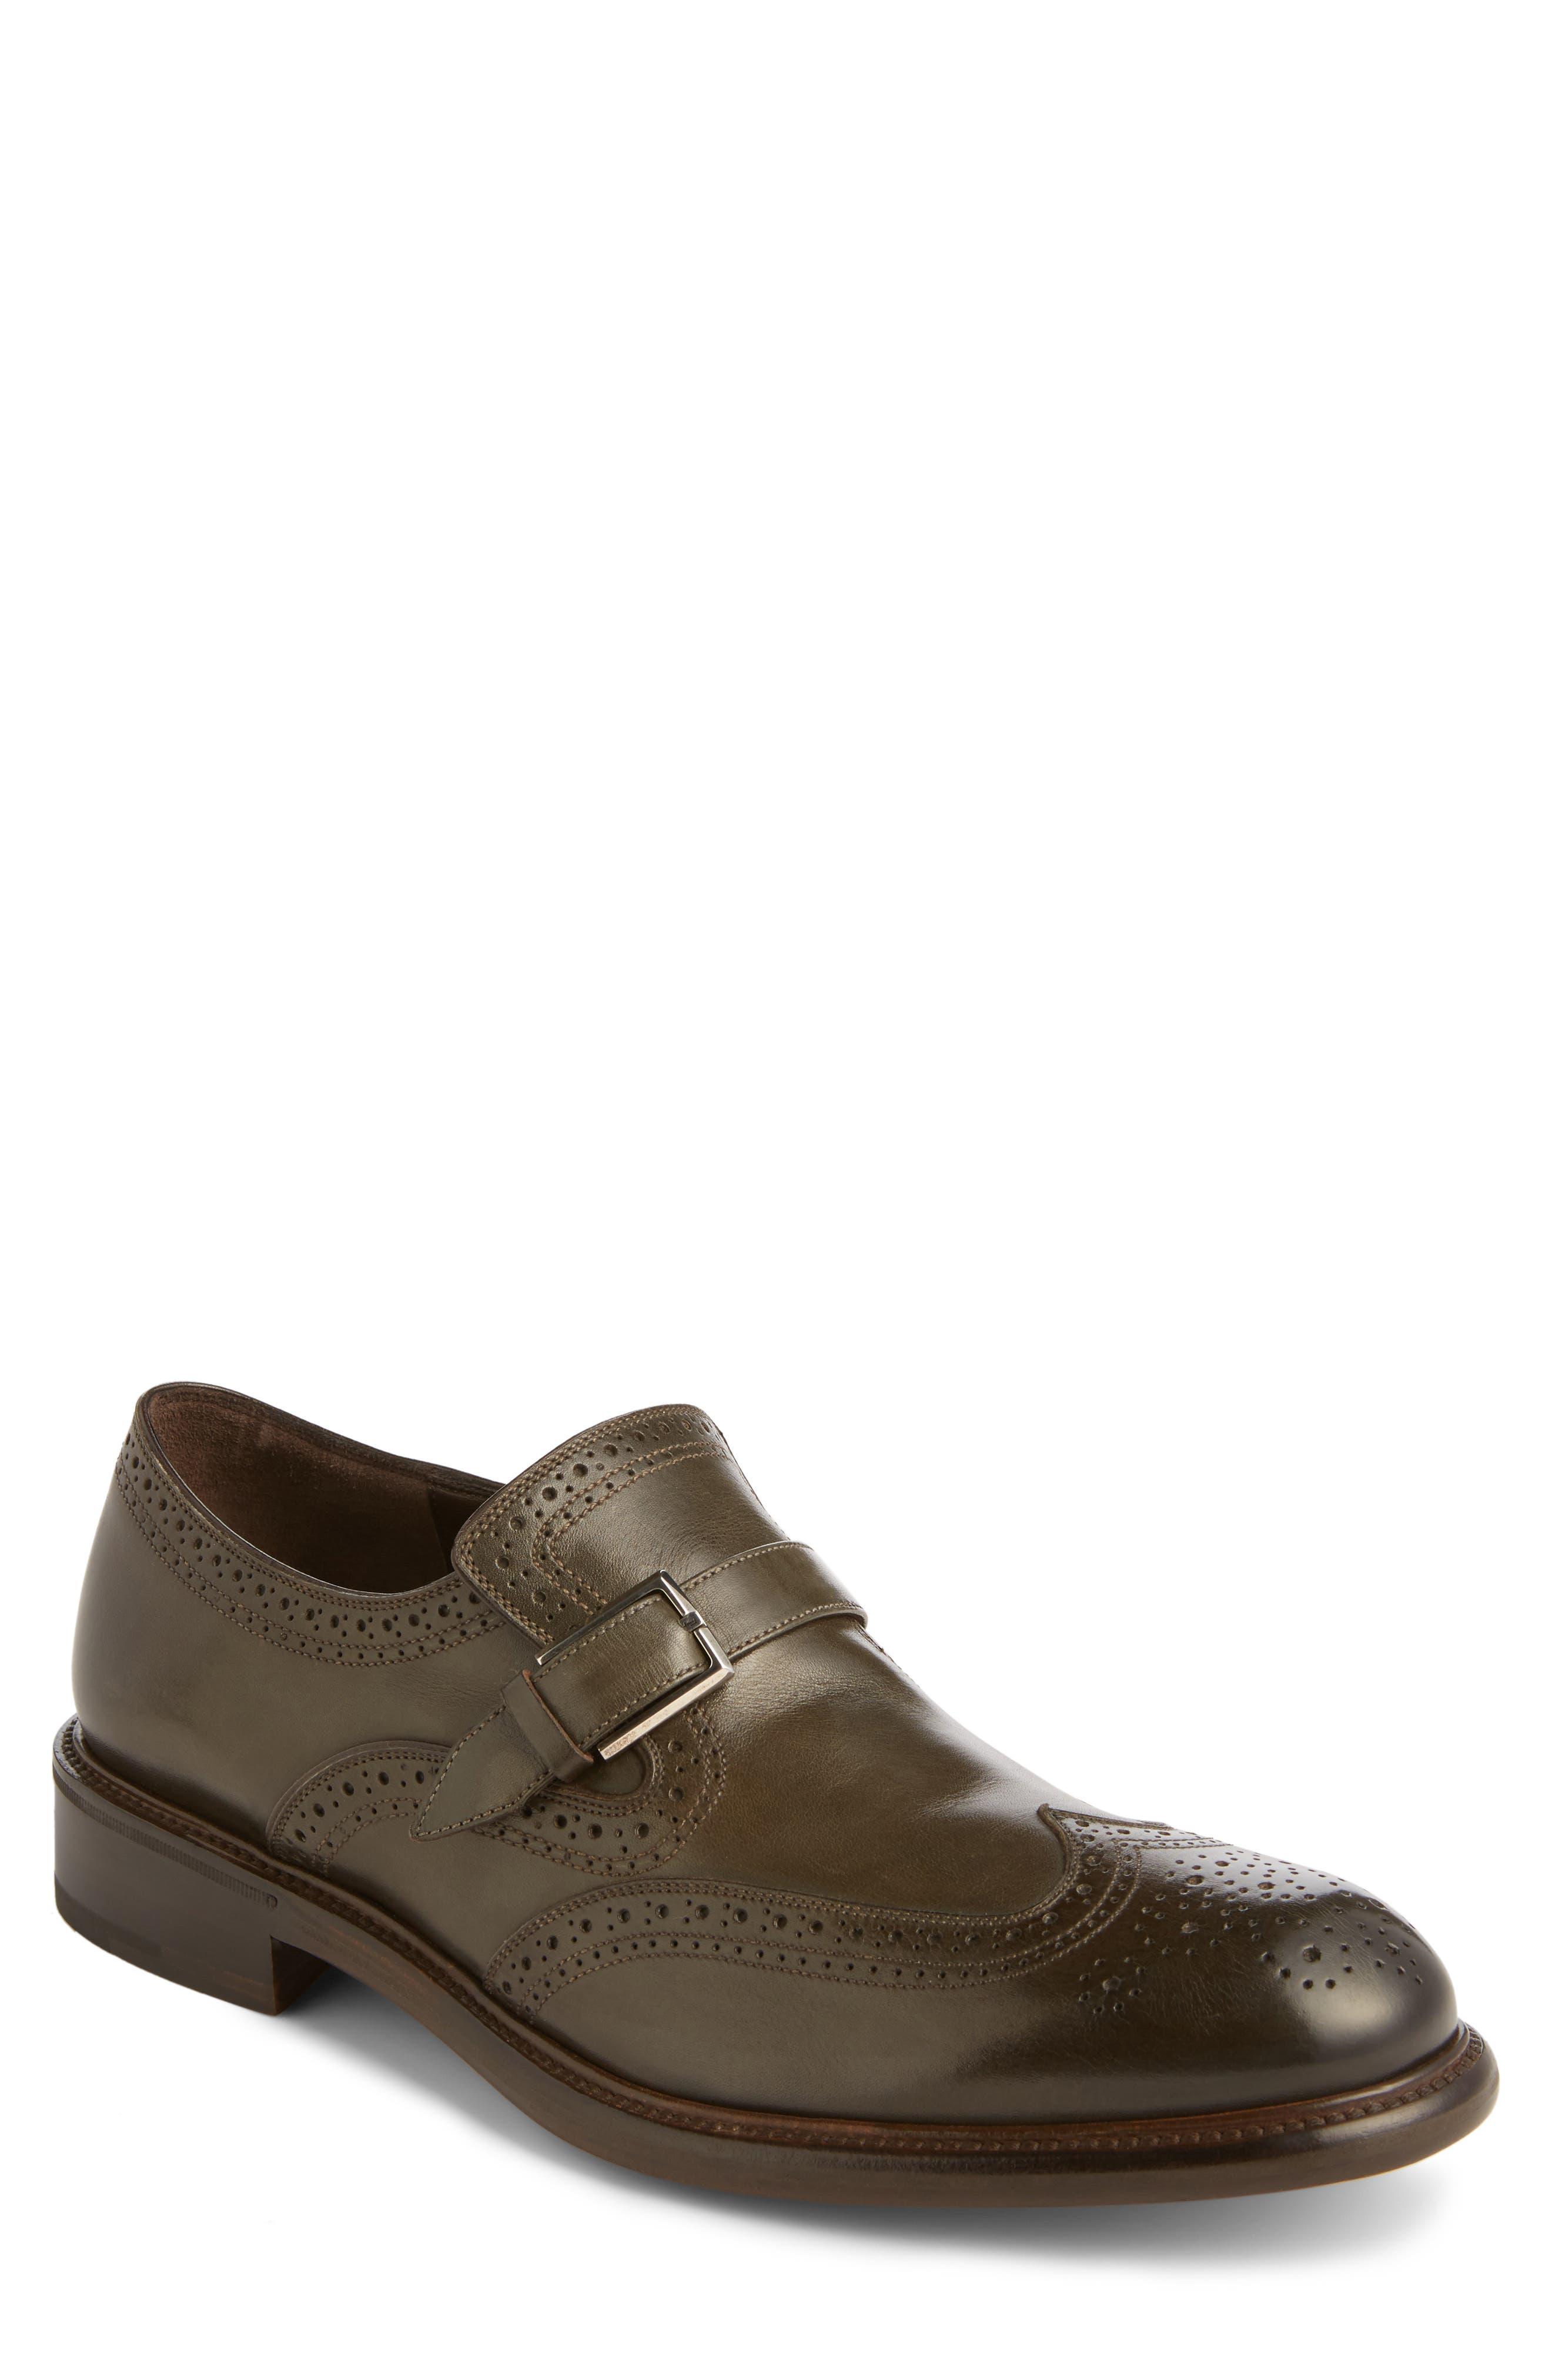 Alternate Image 1 Selected - Salvatore Ferragamo Monk Strap Shoe (Men)